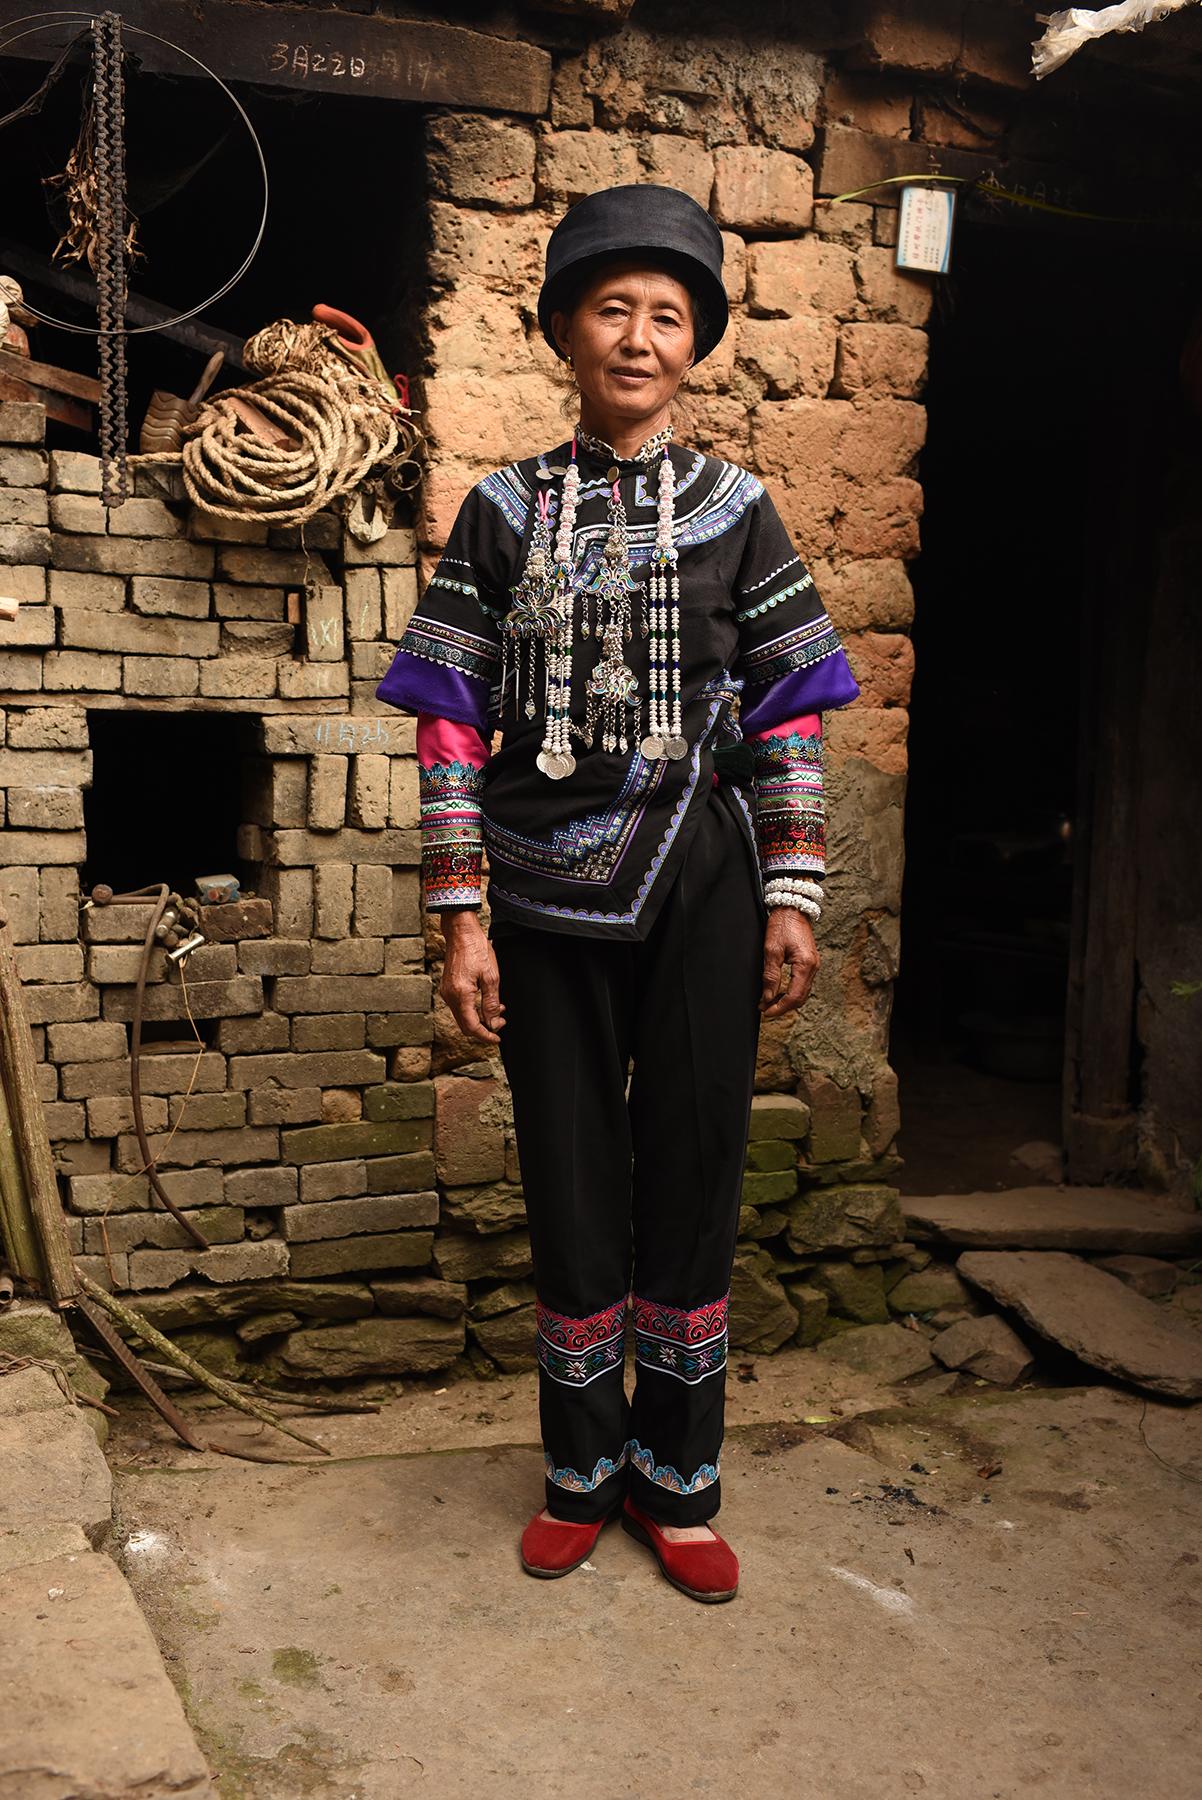 Li Apang, inheritor of Yi Lezuo traditional dance. Dieshi village, Yunnan, 2017.